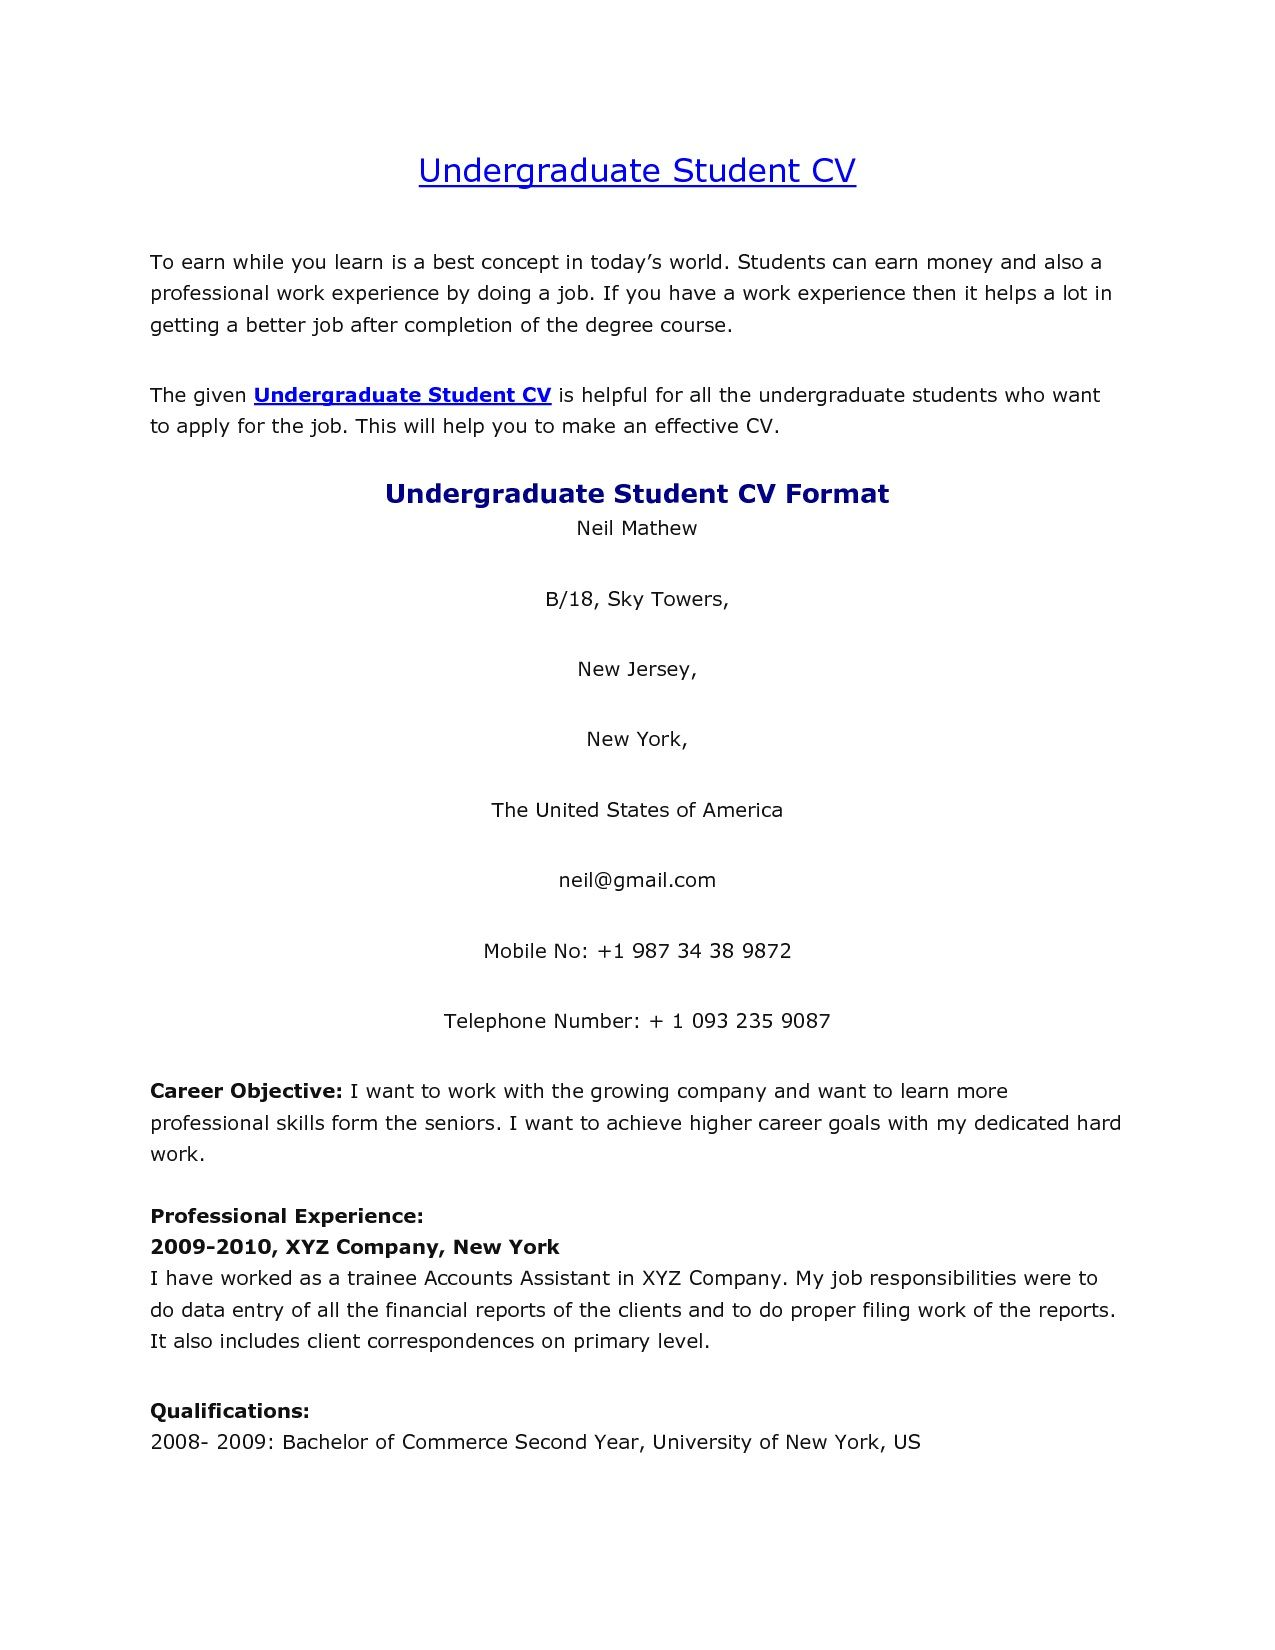 Resume For Undergraduate Student - Resume Sample